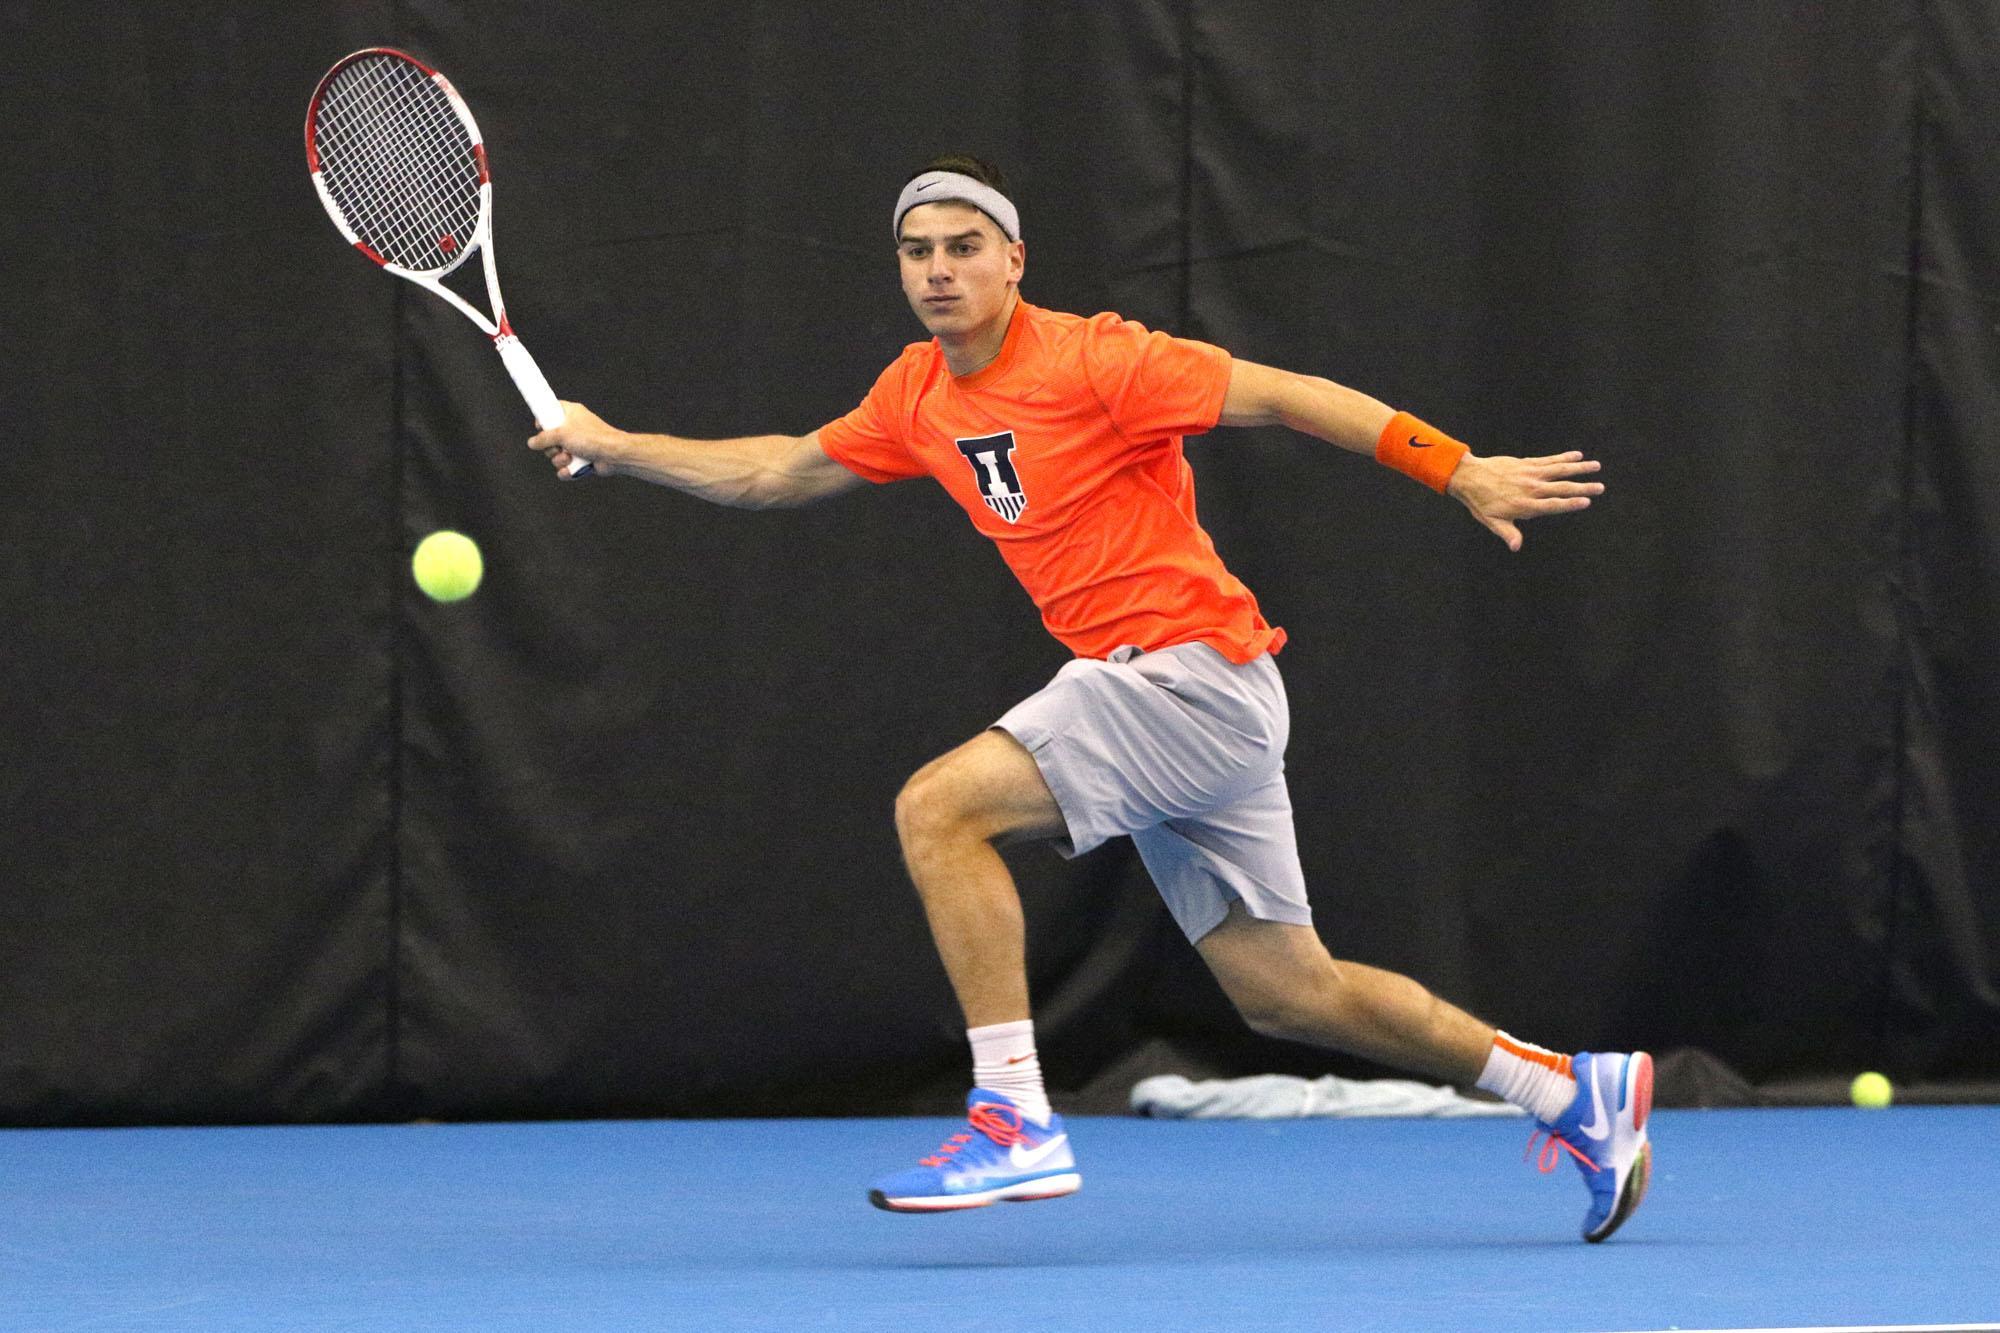 Illinois' Aron Hiltzik runs for the ball during the tennis game v. Ohio State at Atkins Tennis Center on Sunday, Mar. 29, 2015. Illinois won 4-0.